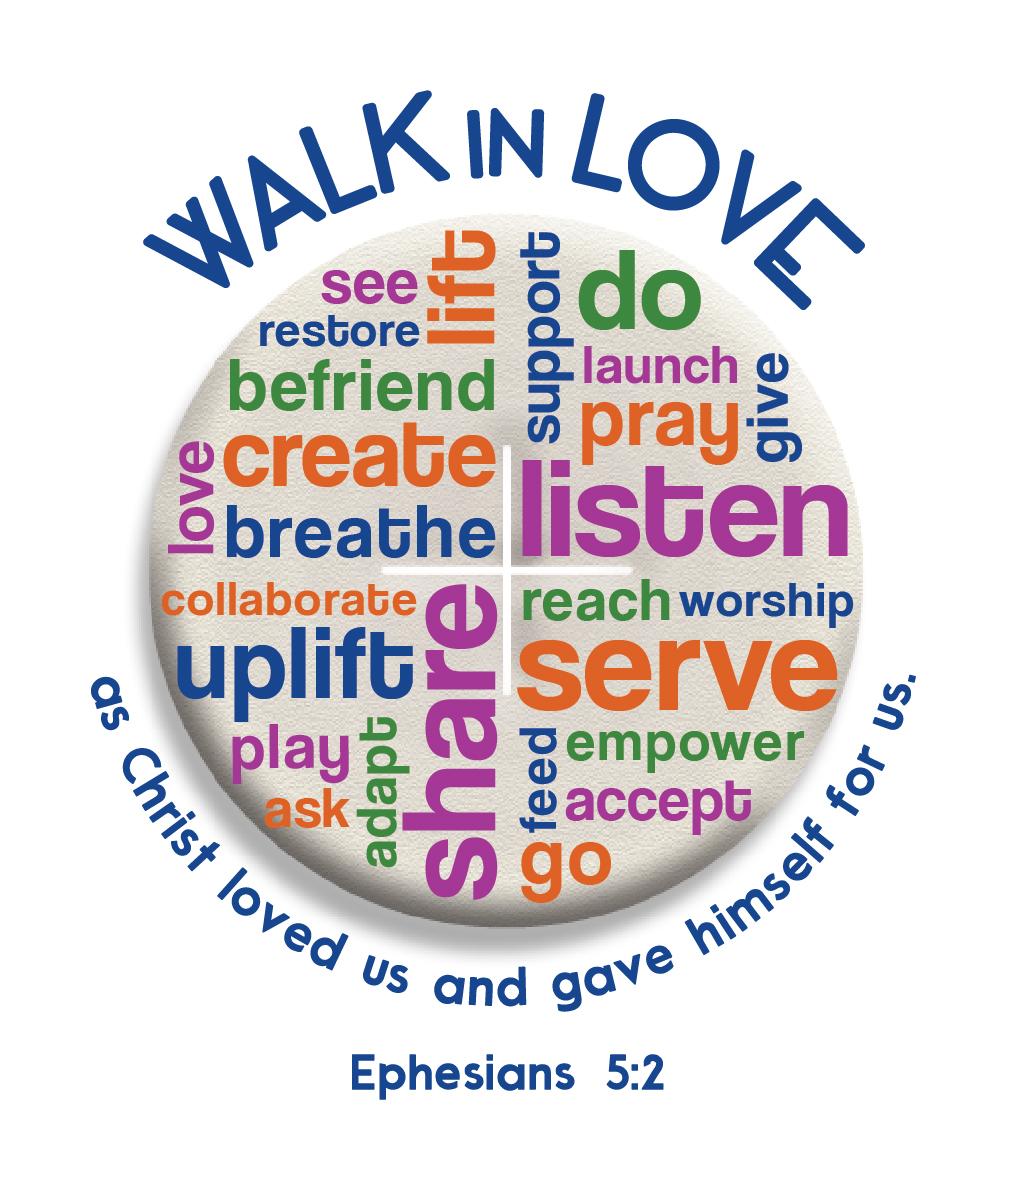 Walk Like Jesus - Walk in Love - Vineyard Church of